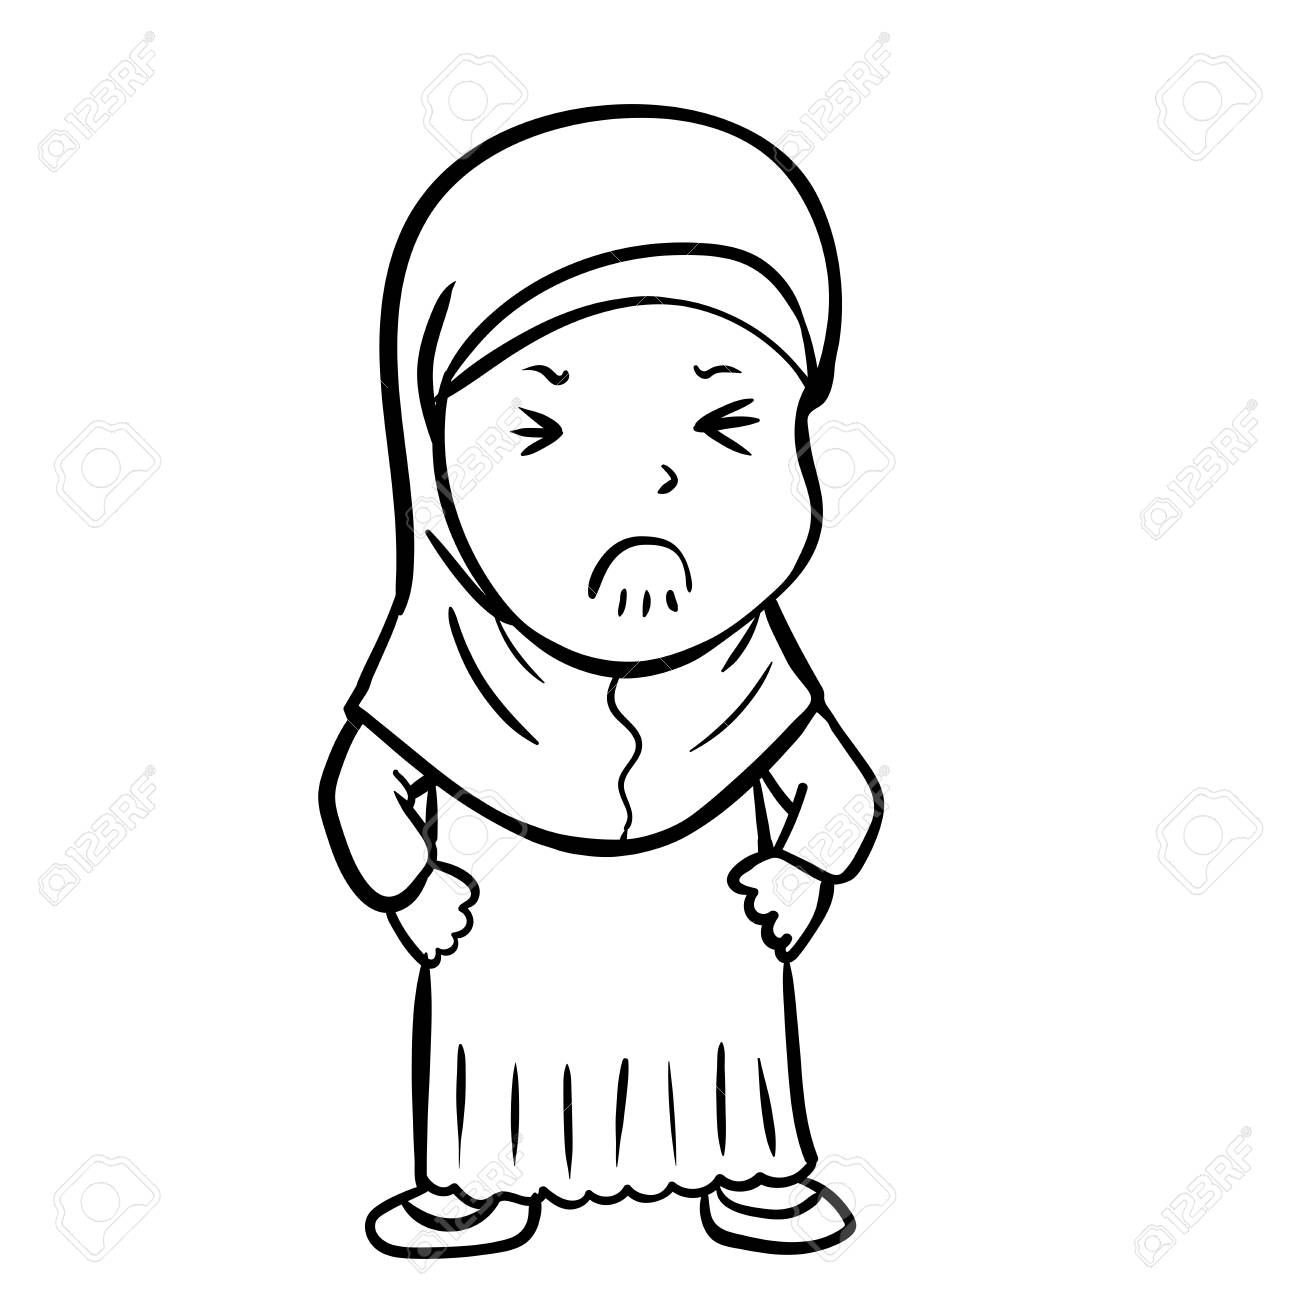 Dessin Dessin Anime De Fille Musulmane Frustree Isole Sur Fond